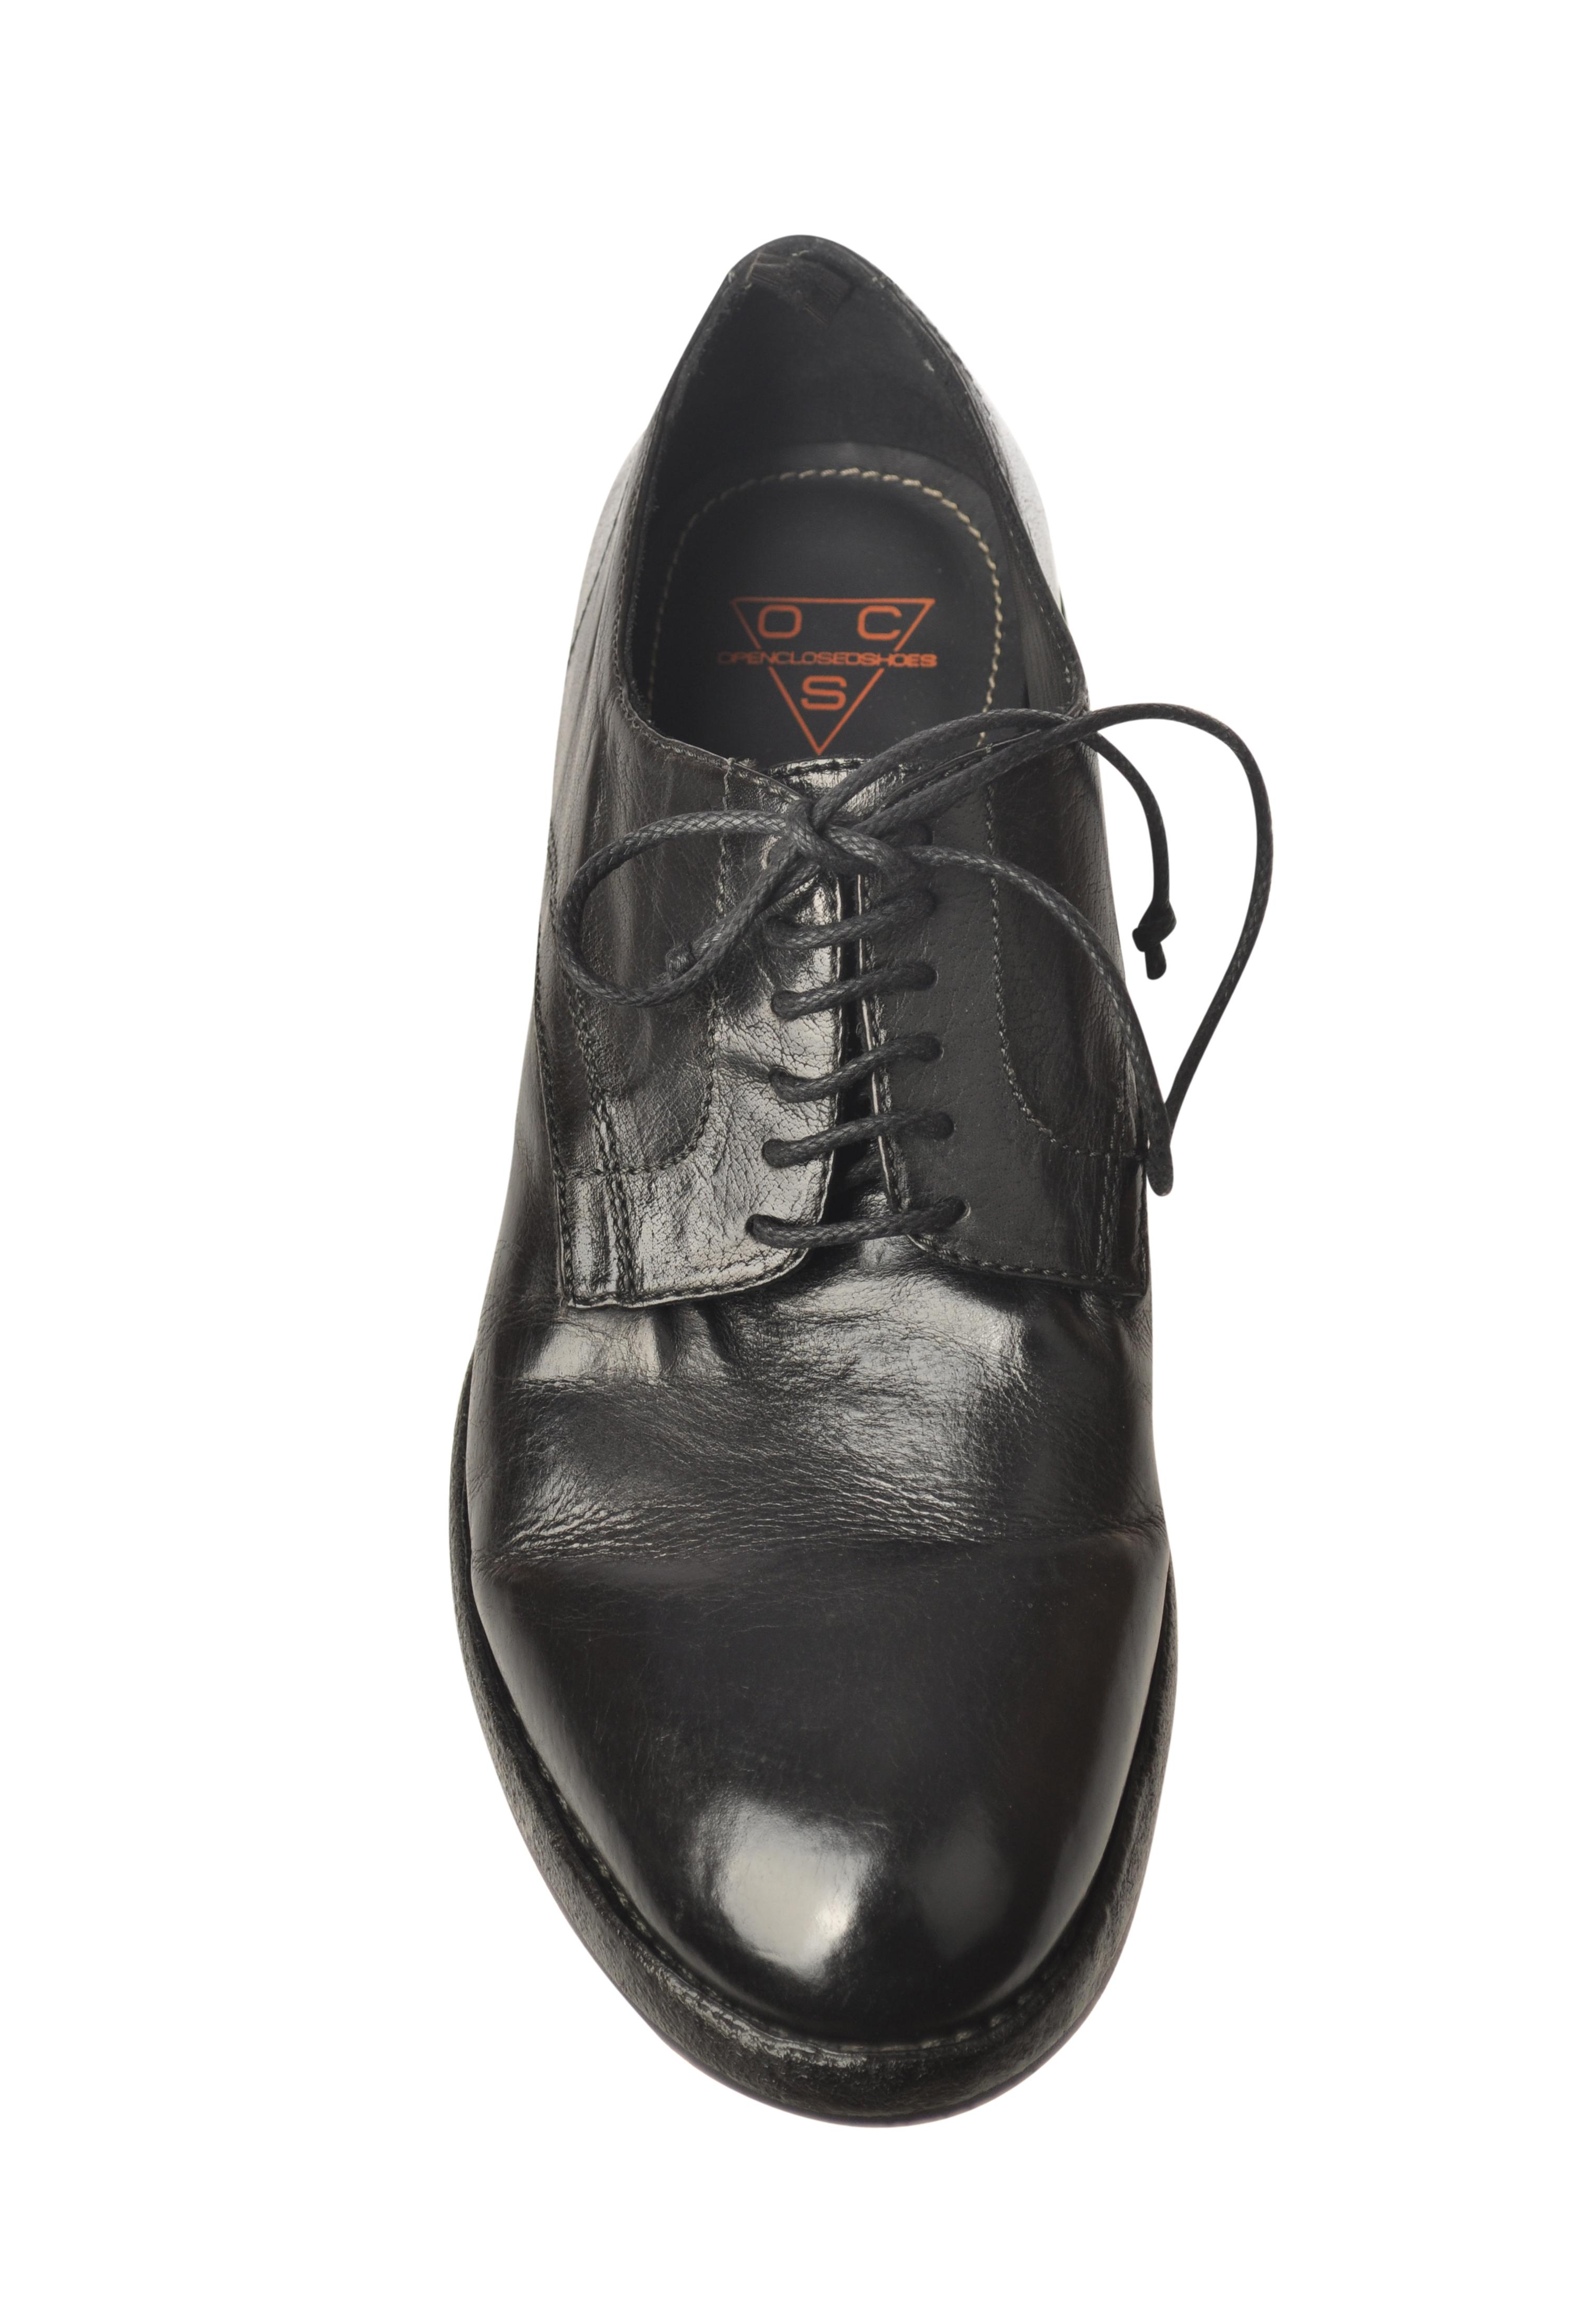 Openclosedshoes - Zapatos-Lace 5787405M183942 Up - Hombre - Negro - 5787405M183942 Zapatos-Lace 295400